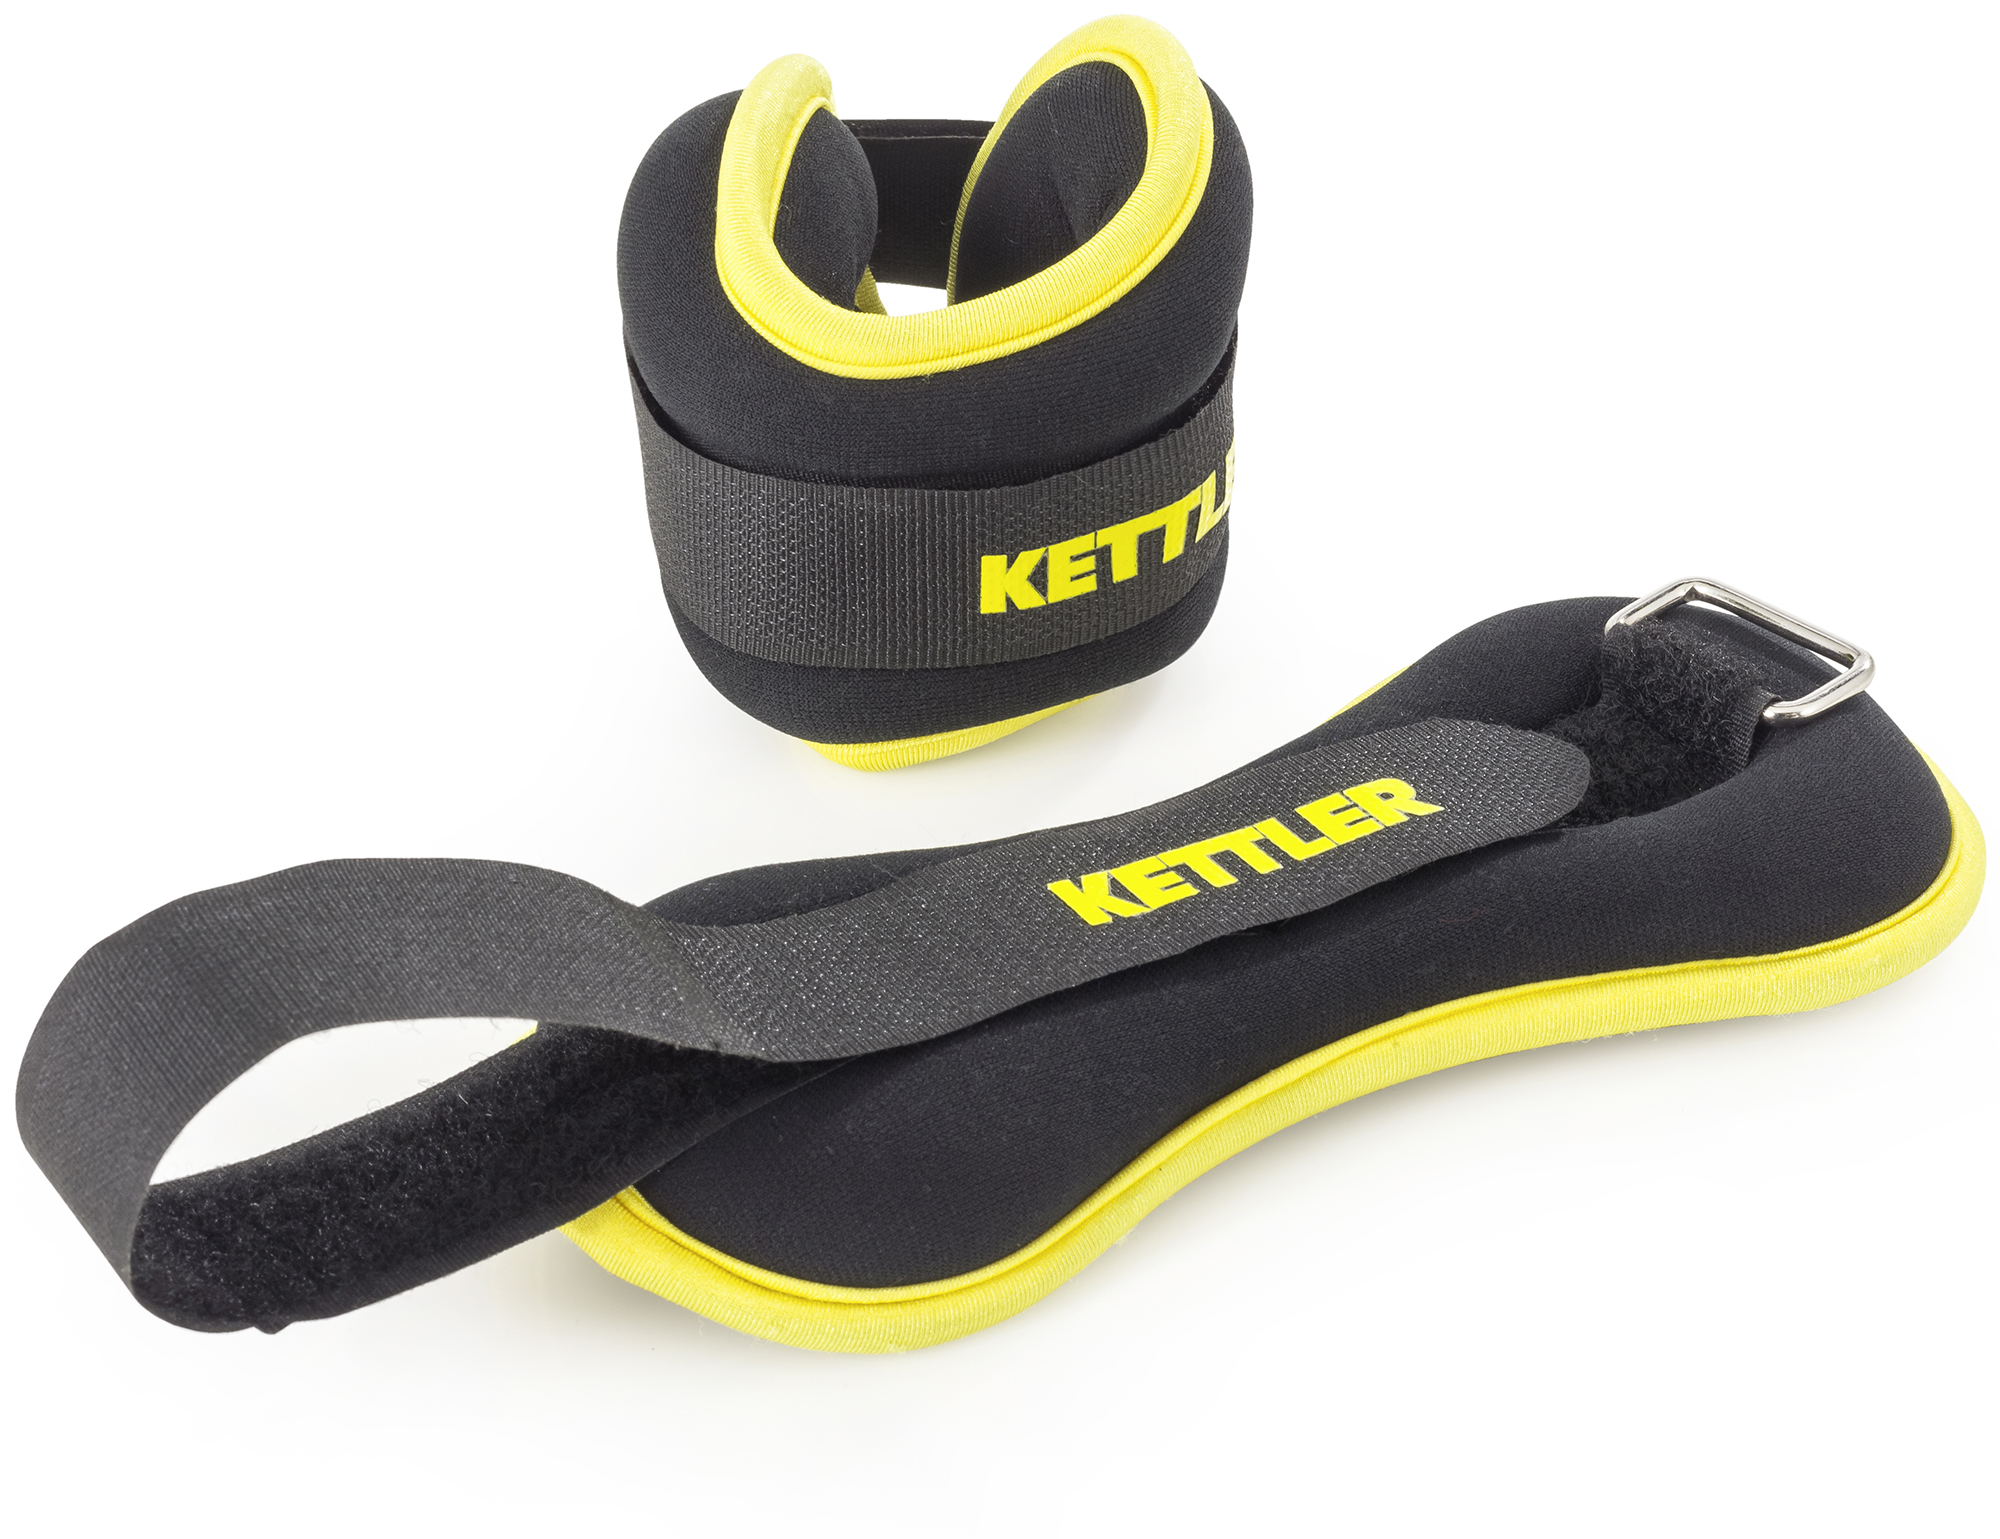 Kettler Утяжелители, Kettler 2 х 1 кг утяжелители atemi цвет черный 2 х 2 кг